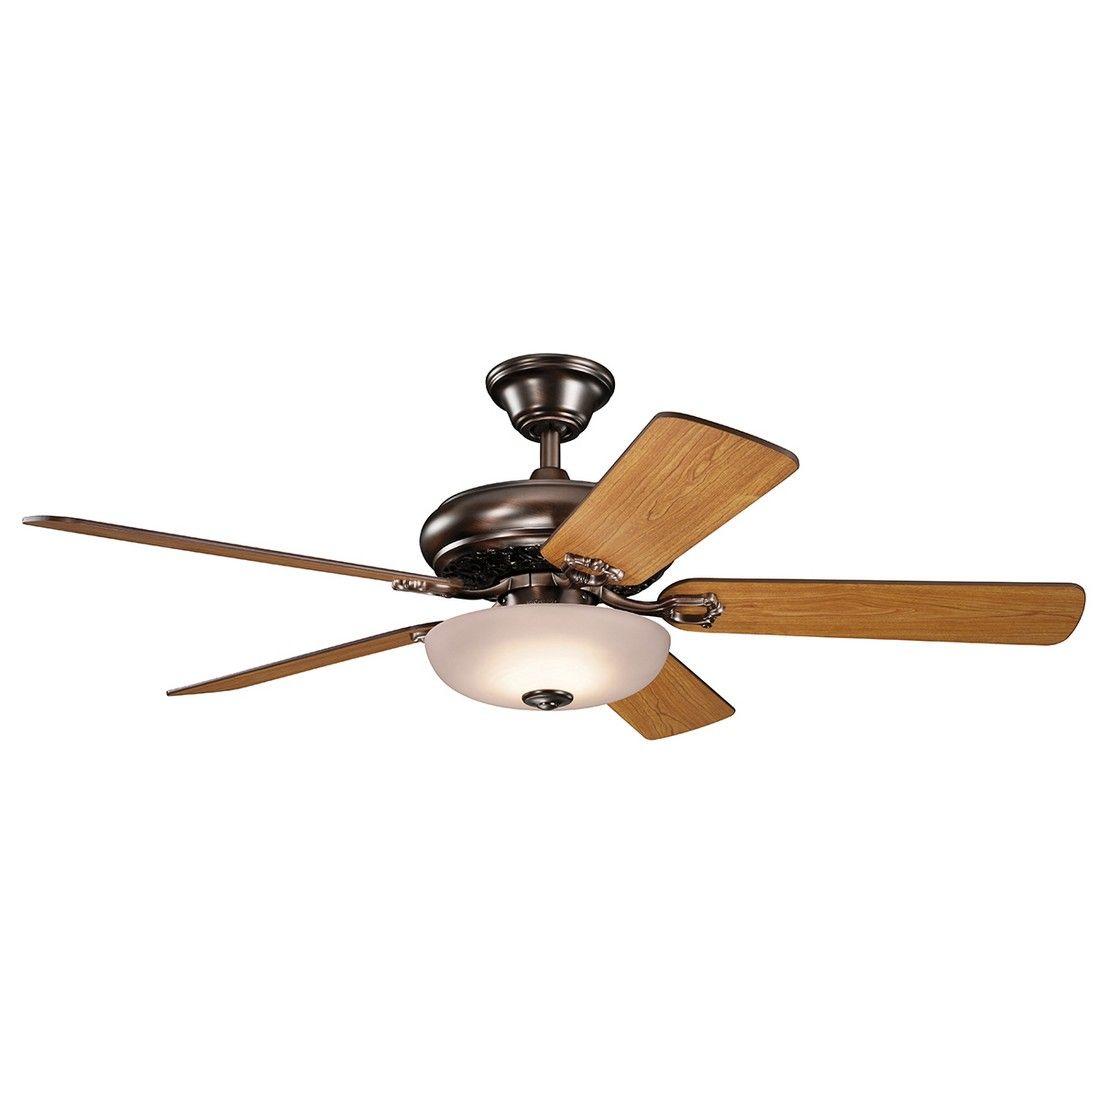 "Kichler Bentzen Select 52"" LED Ceiling Fan In Oil Brushed"